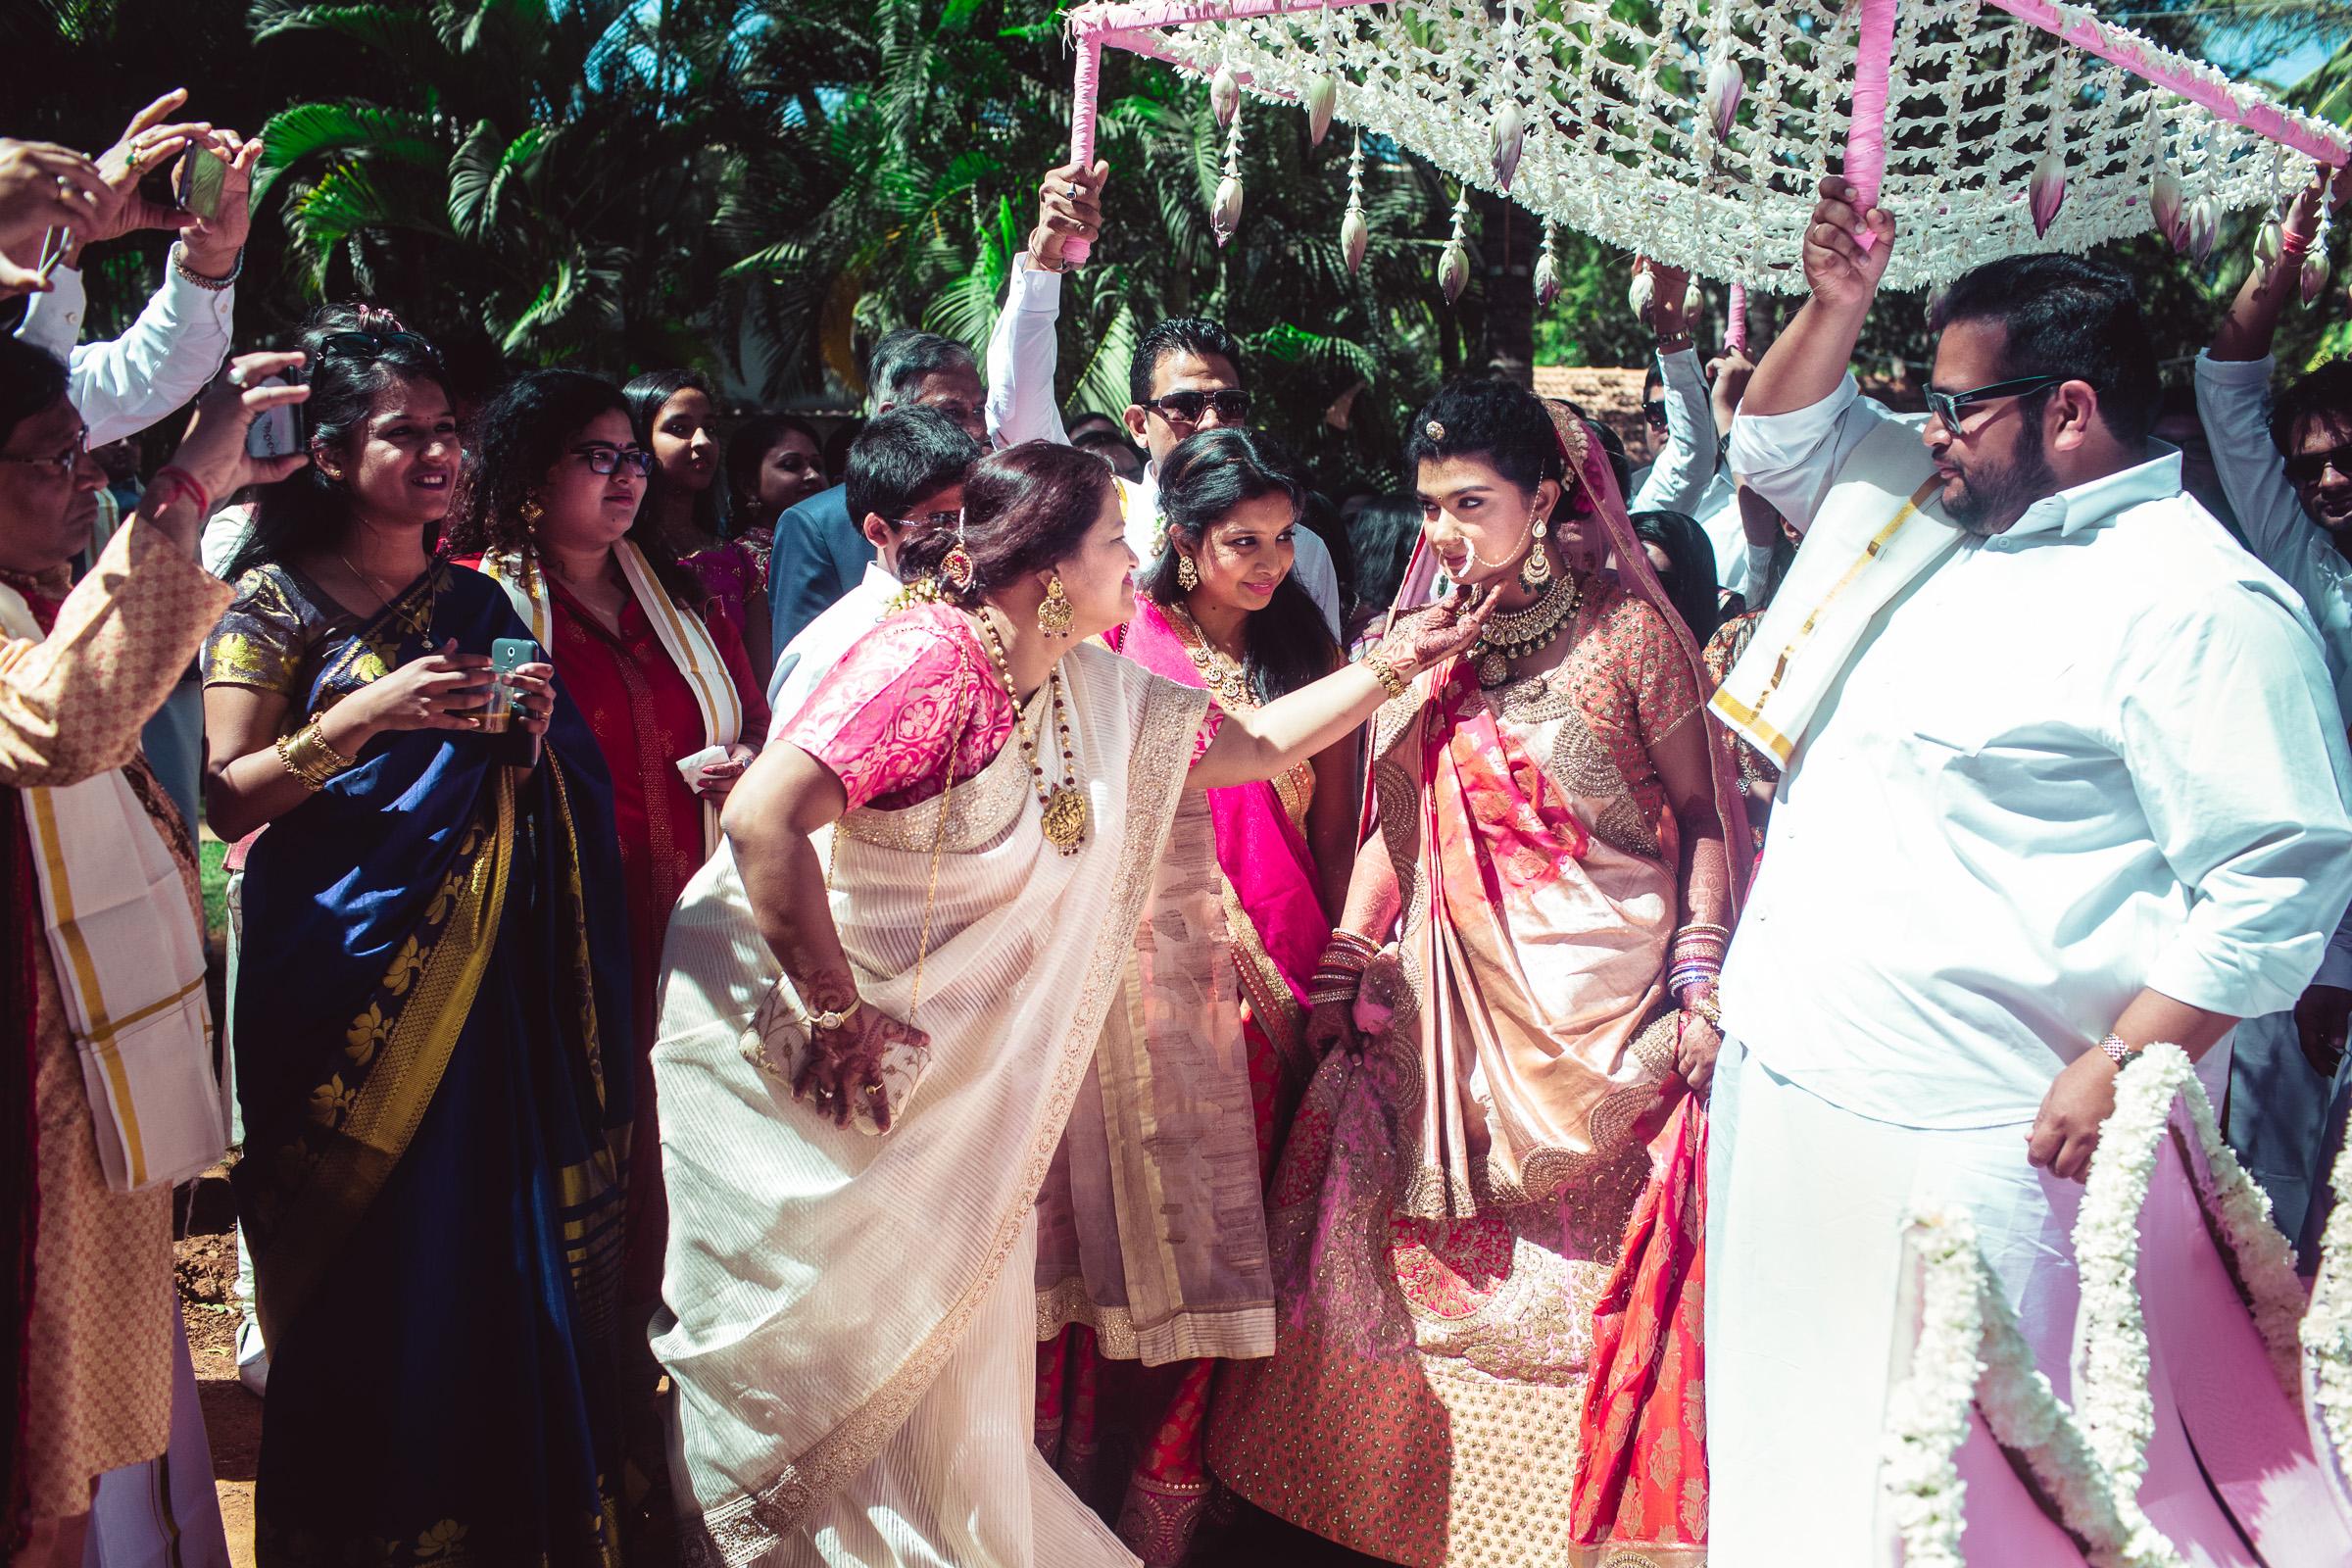 marwari-candid-wedding-photographers-bangalore-0029.jpg